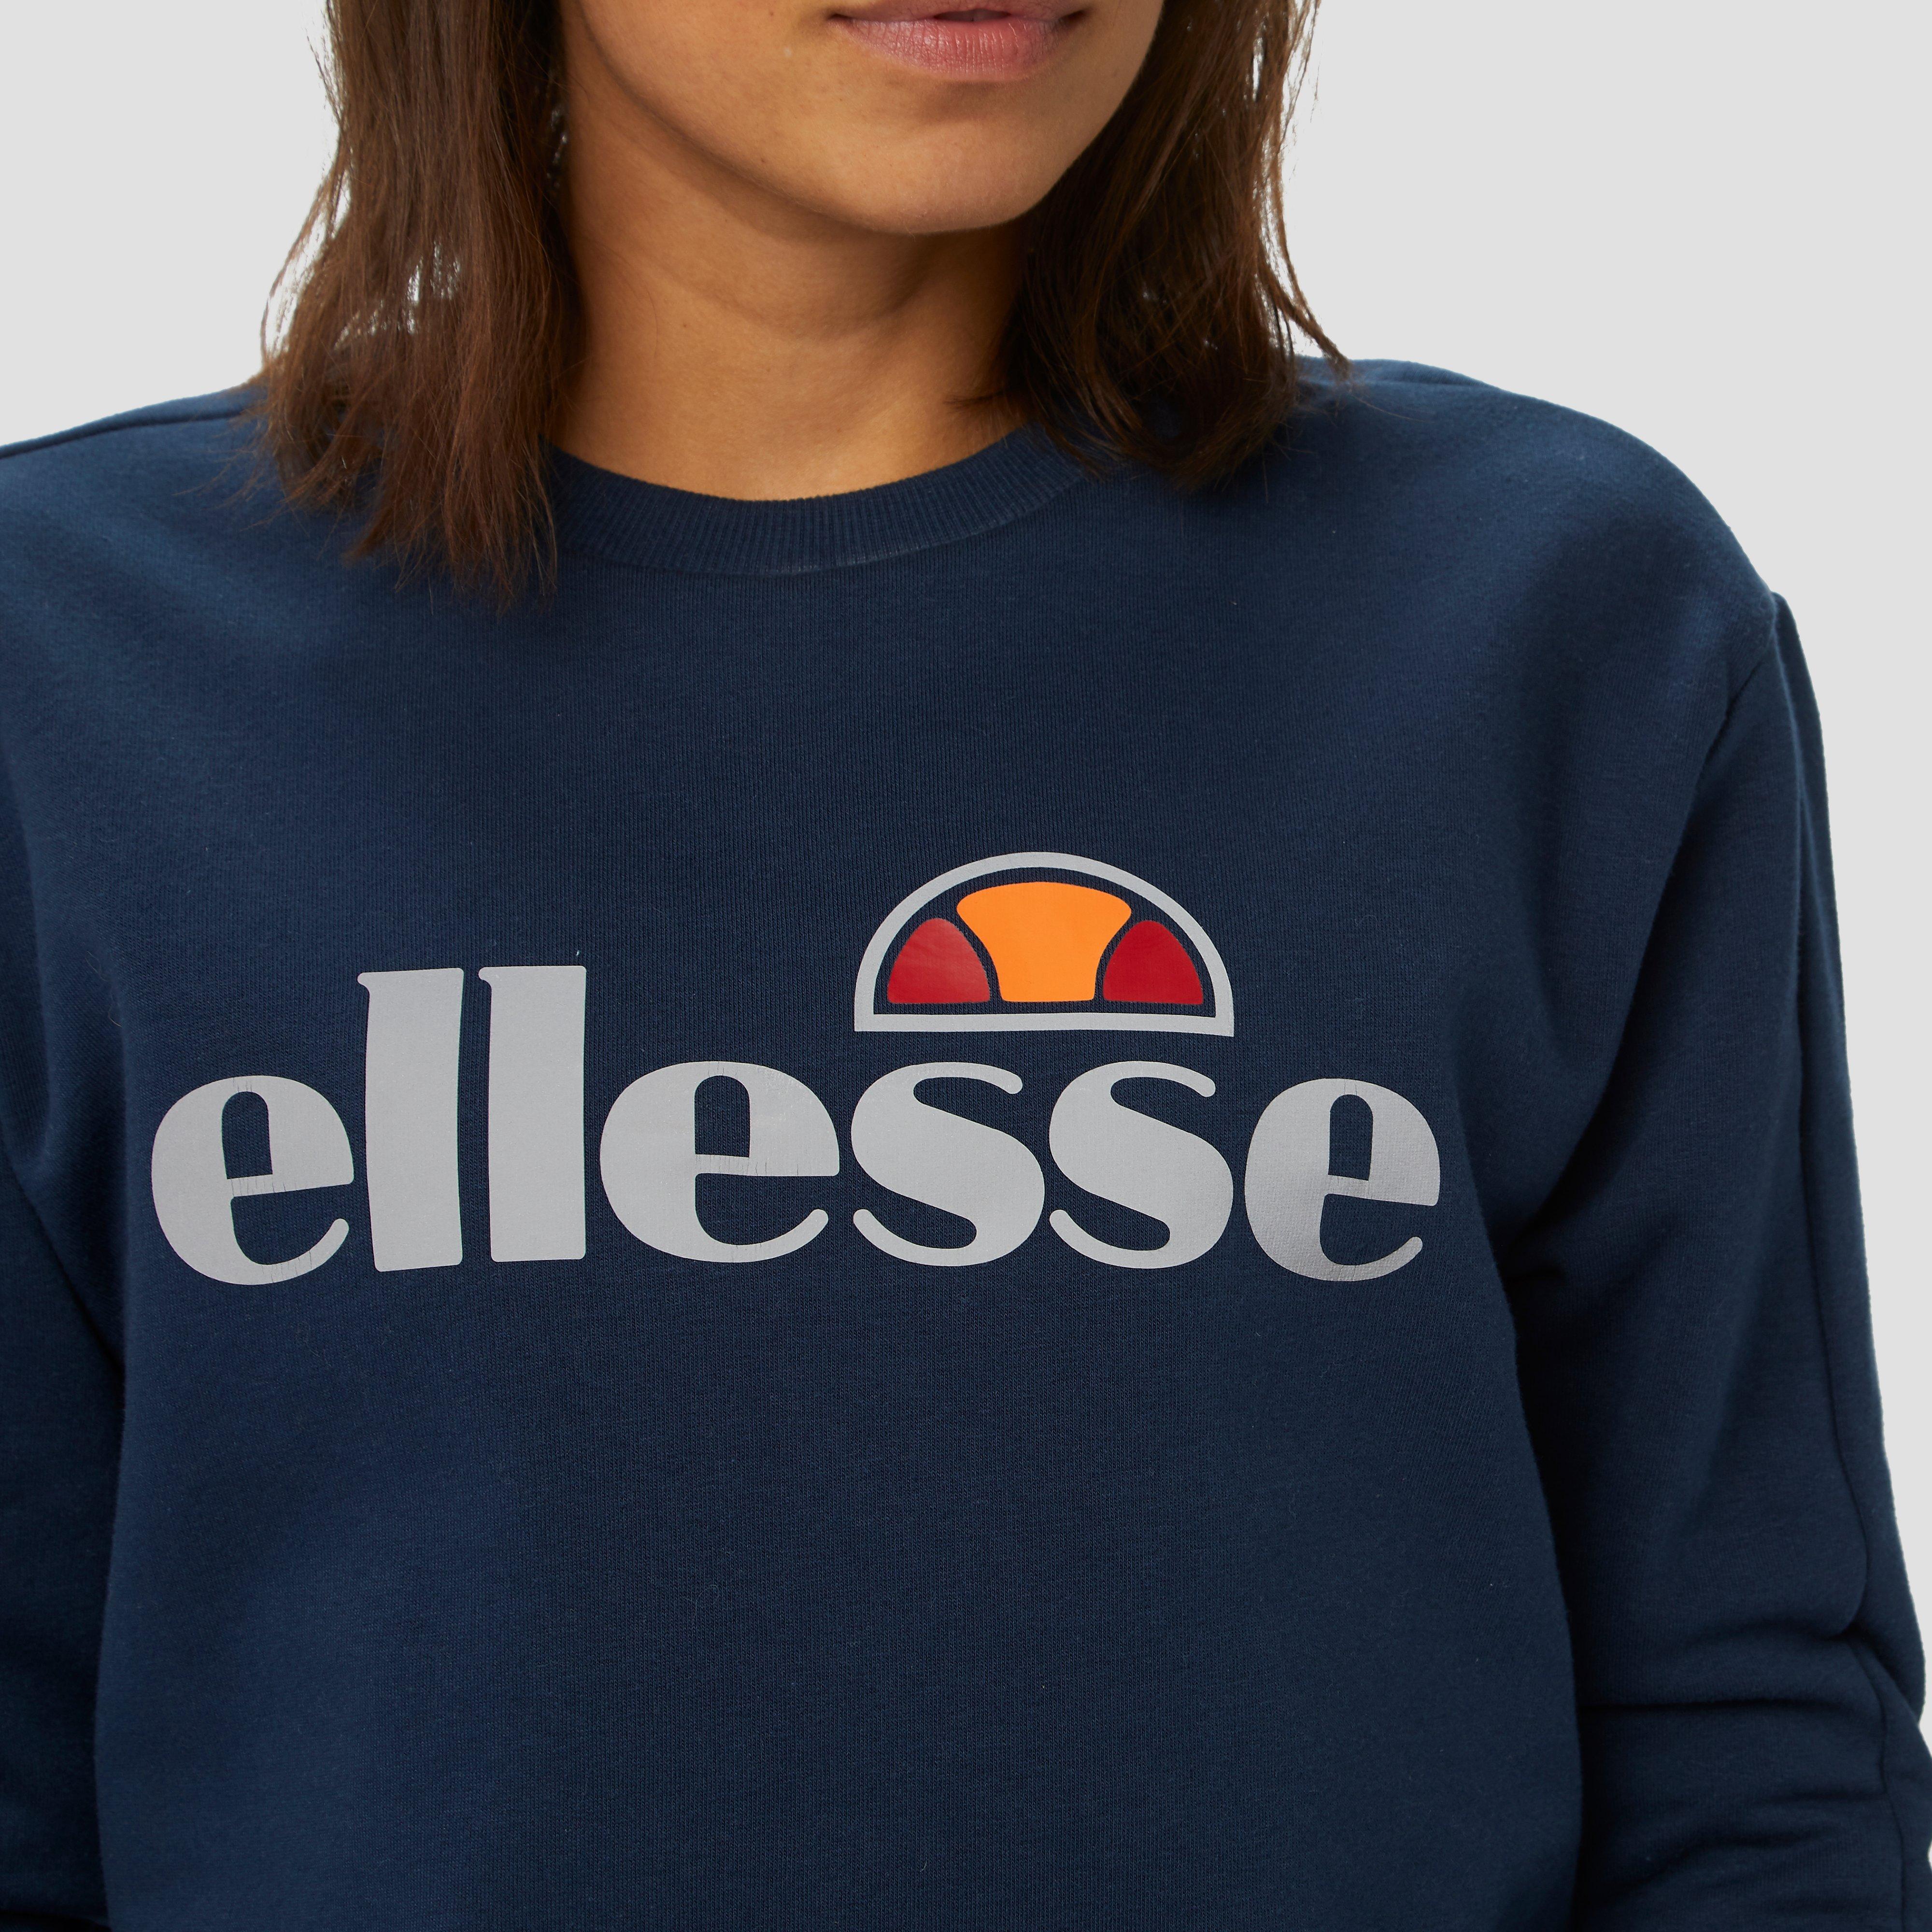 ELLESSE SARRINO SWEATER BLAUW DAMES